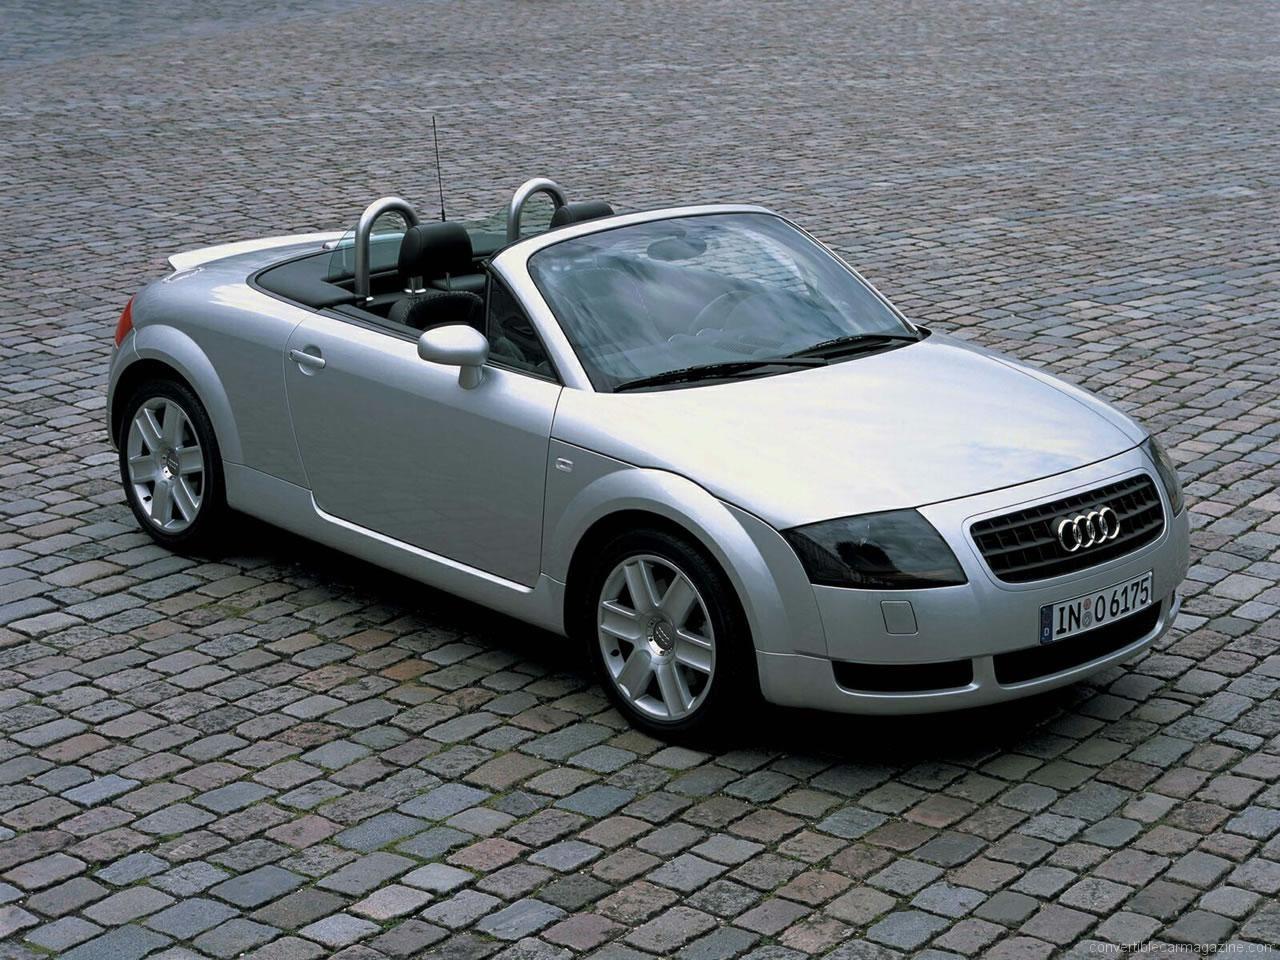 Audi Tt Convertible Hardtop Audi Tt Pinterest Audi TT - Audi hardtop convertible